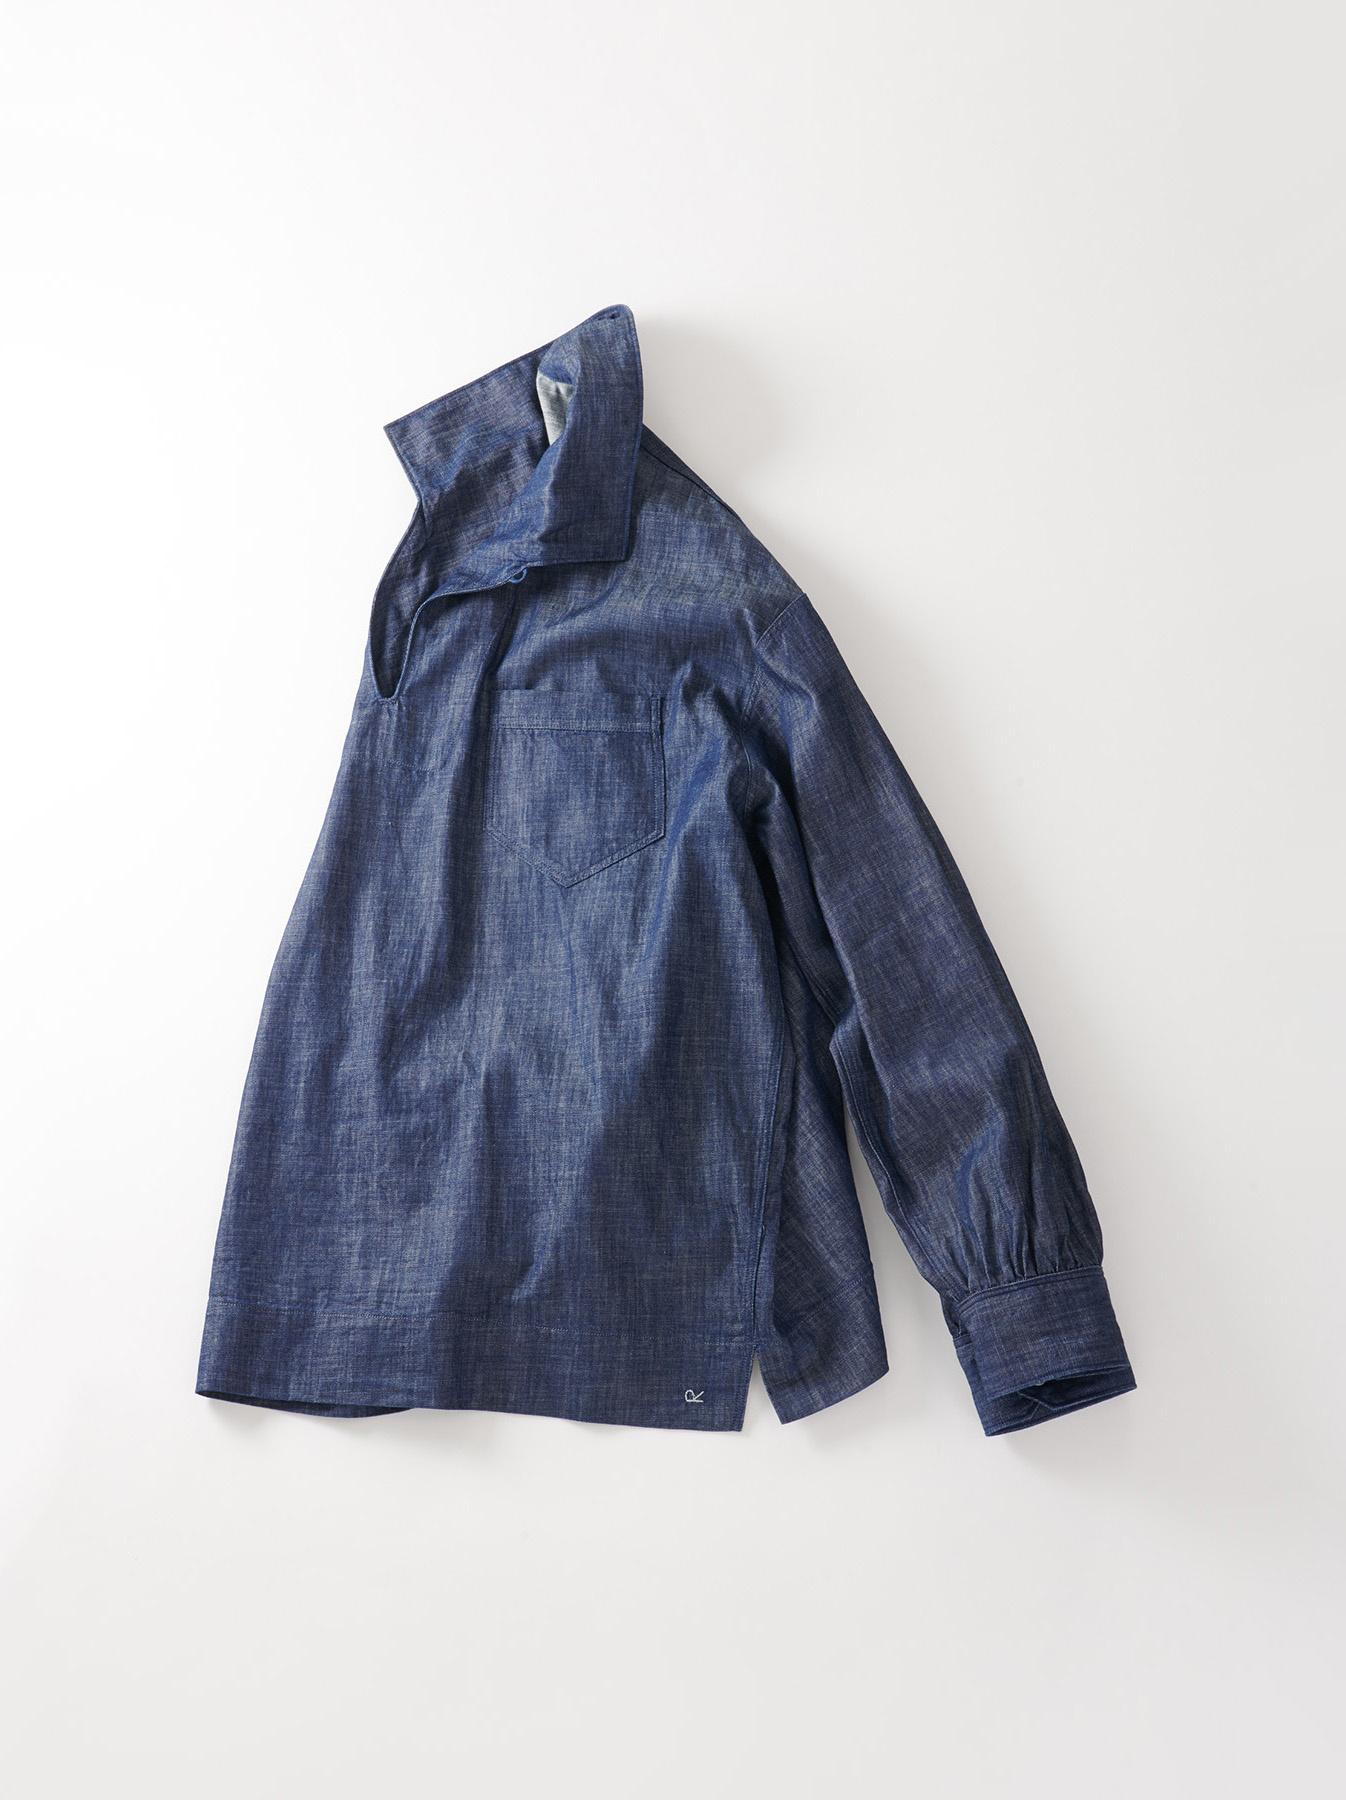 WH Goma Denim Umahiko Pullover Shirt-1